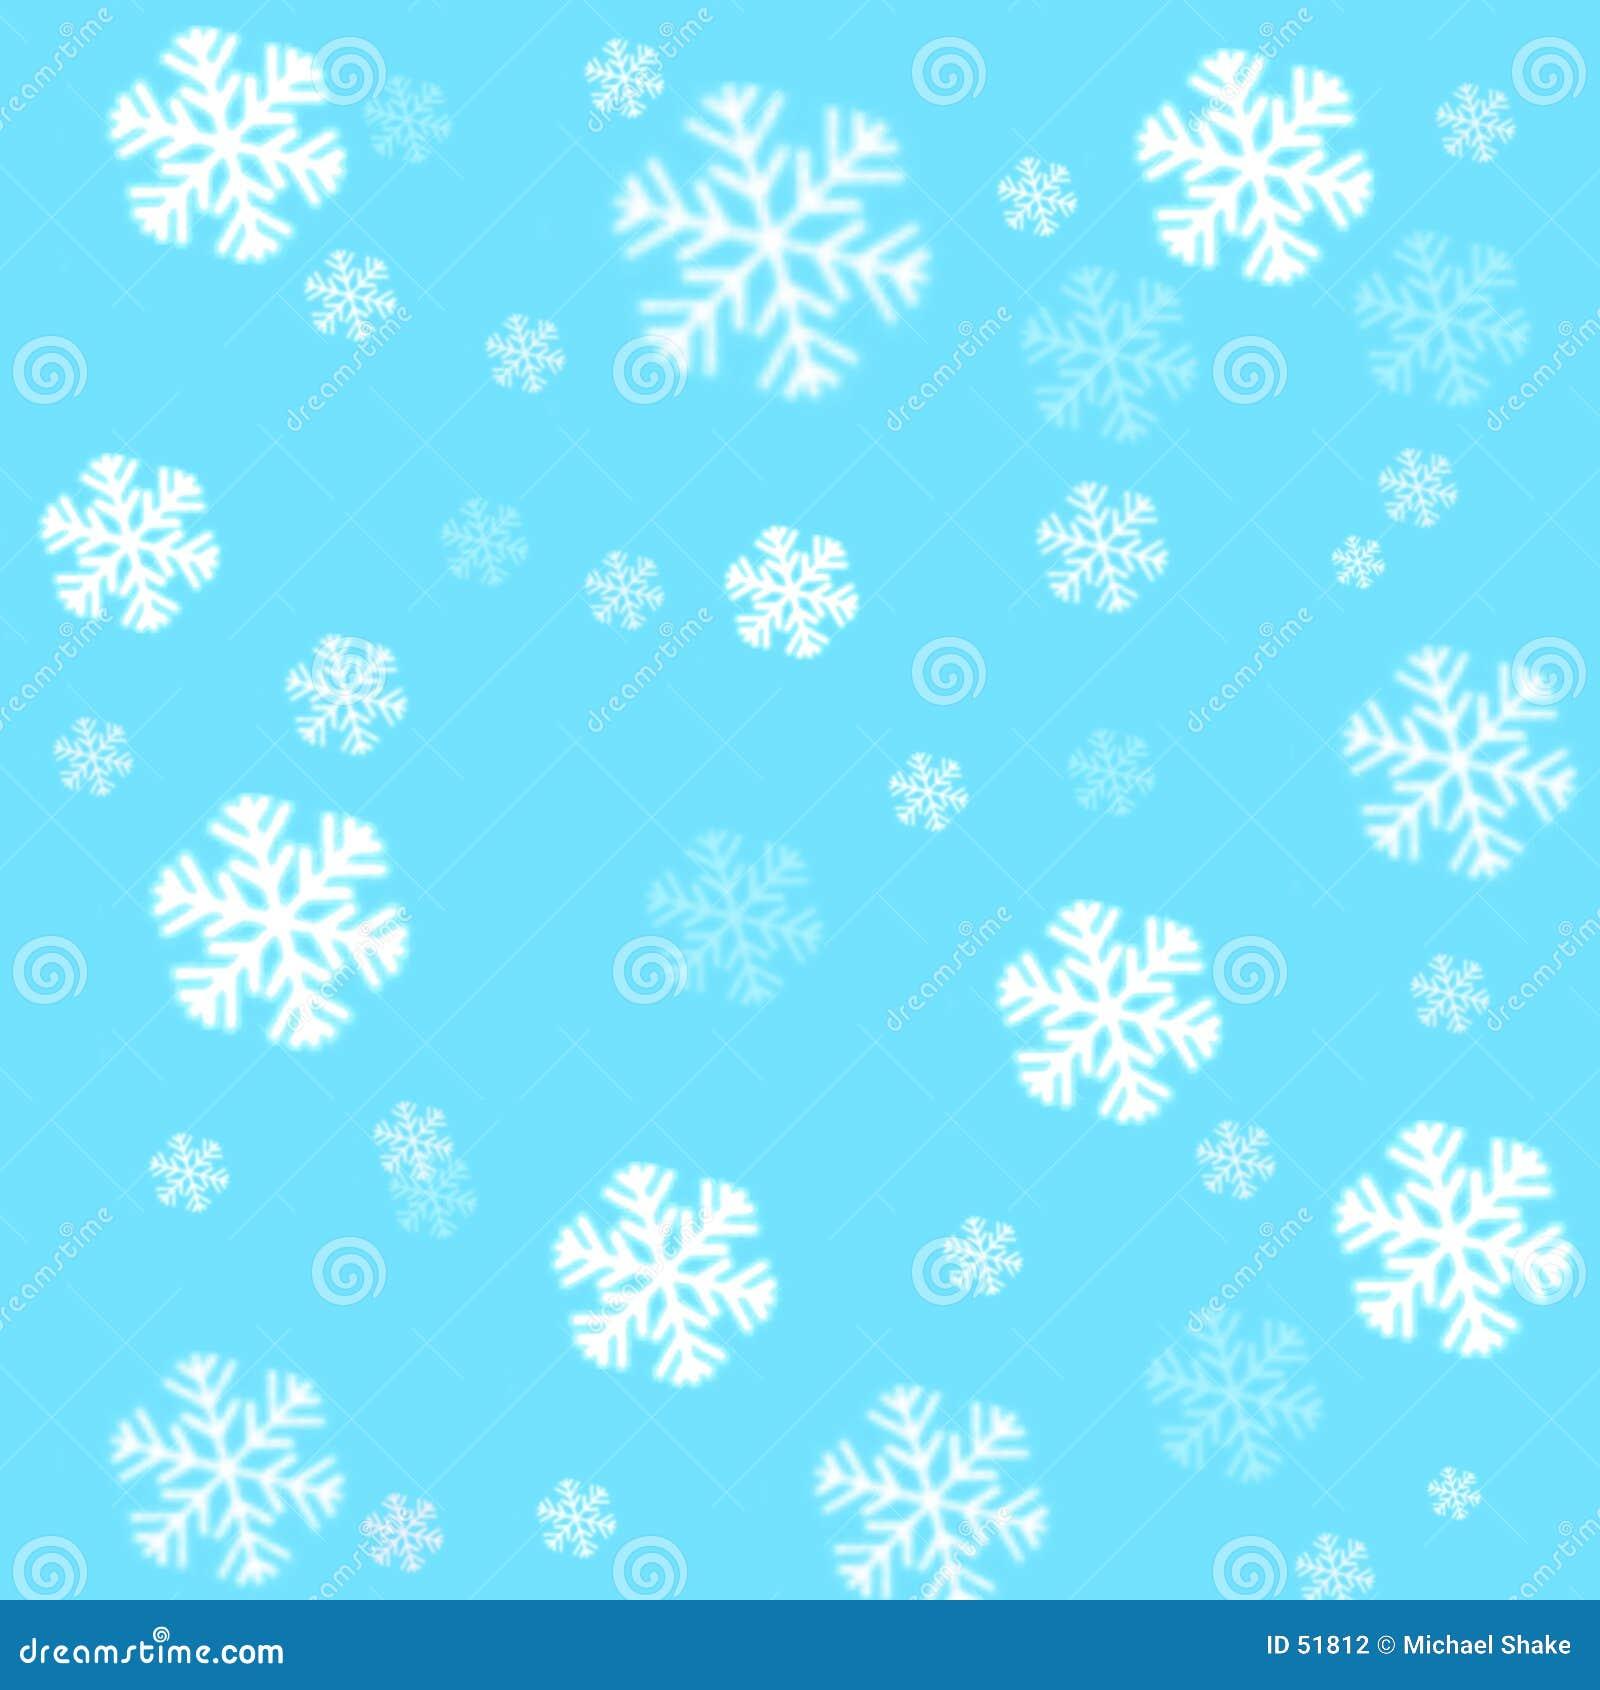 снежинки голубого неба предпосылки